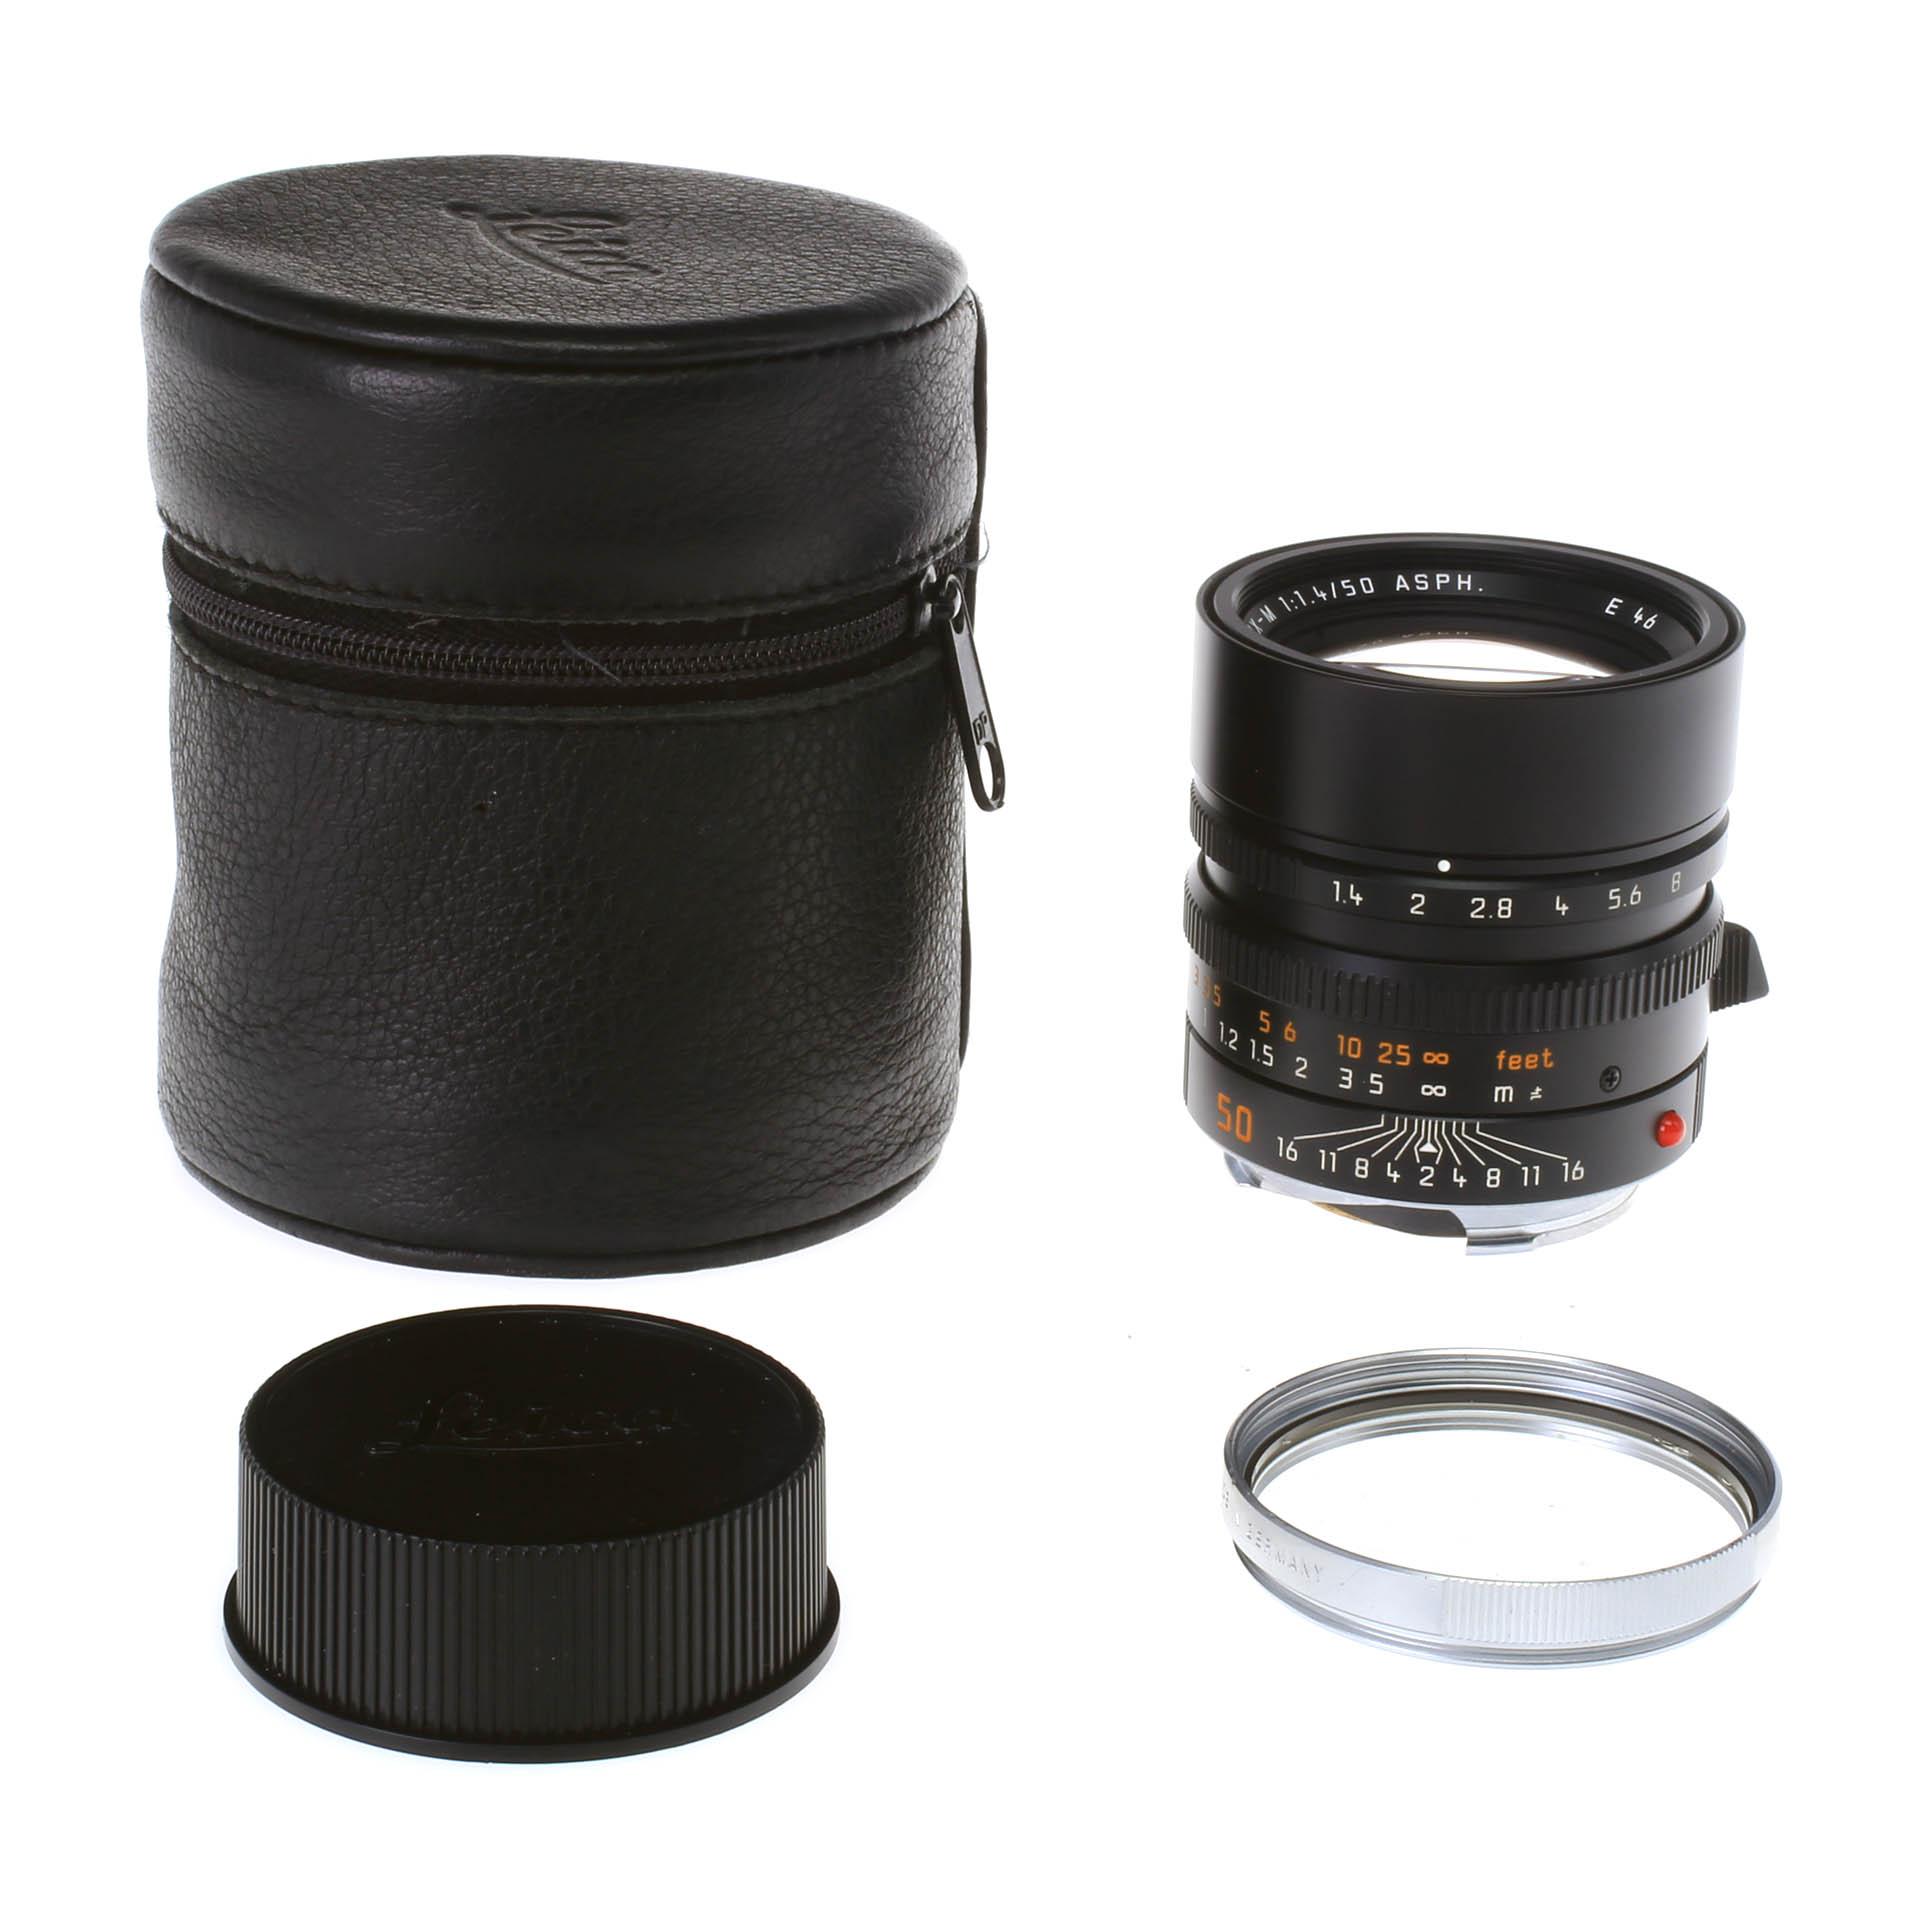 Used Lenses Rangefinder - National Camera Exchange